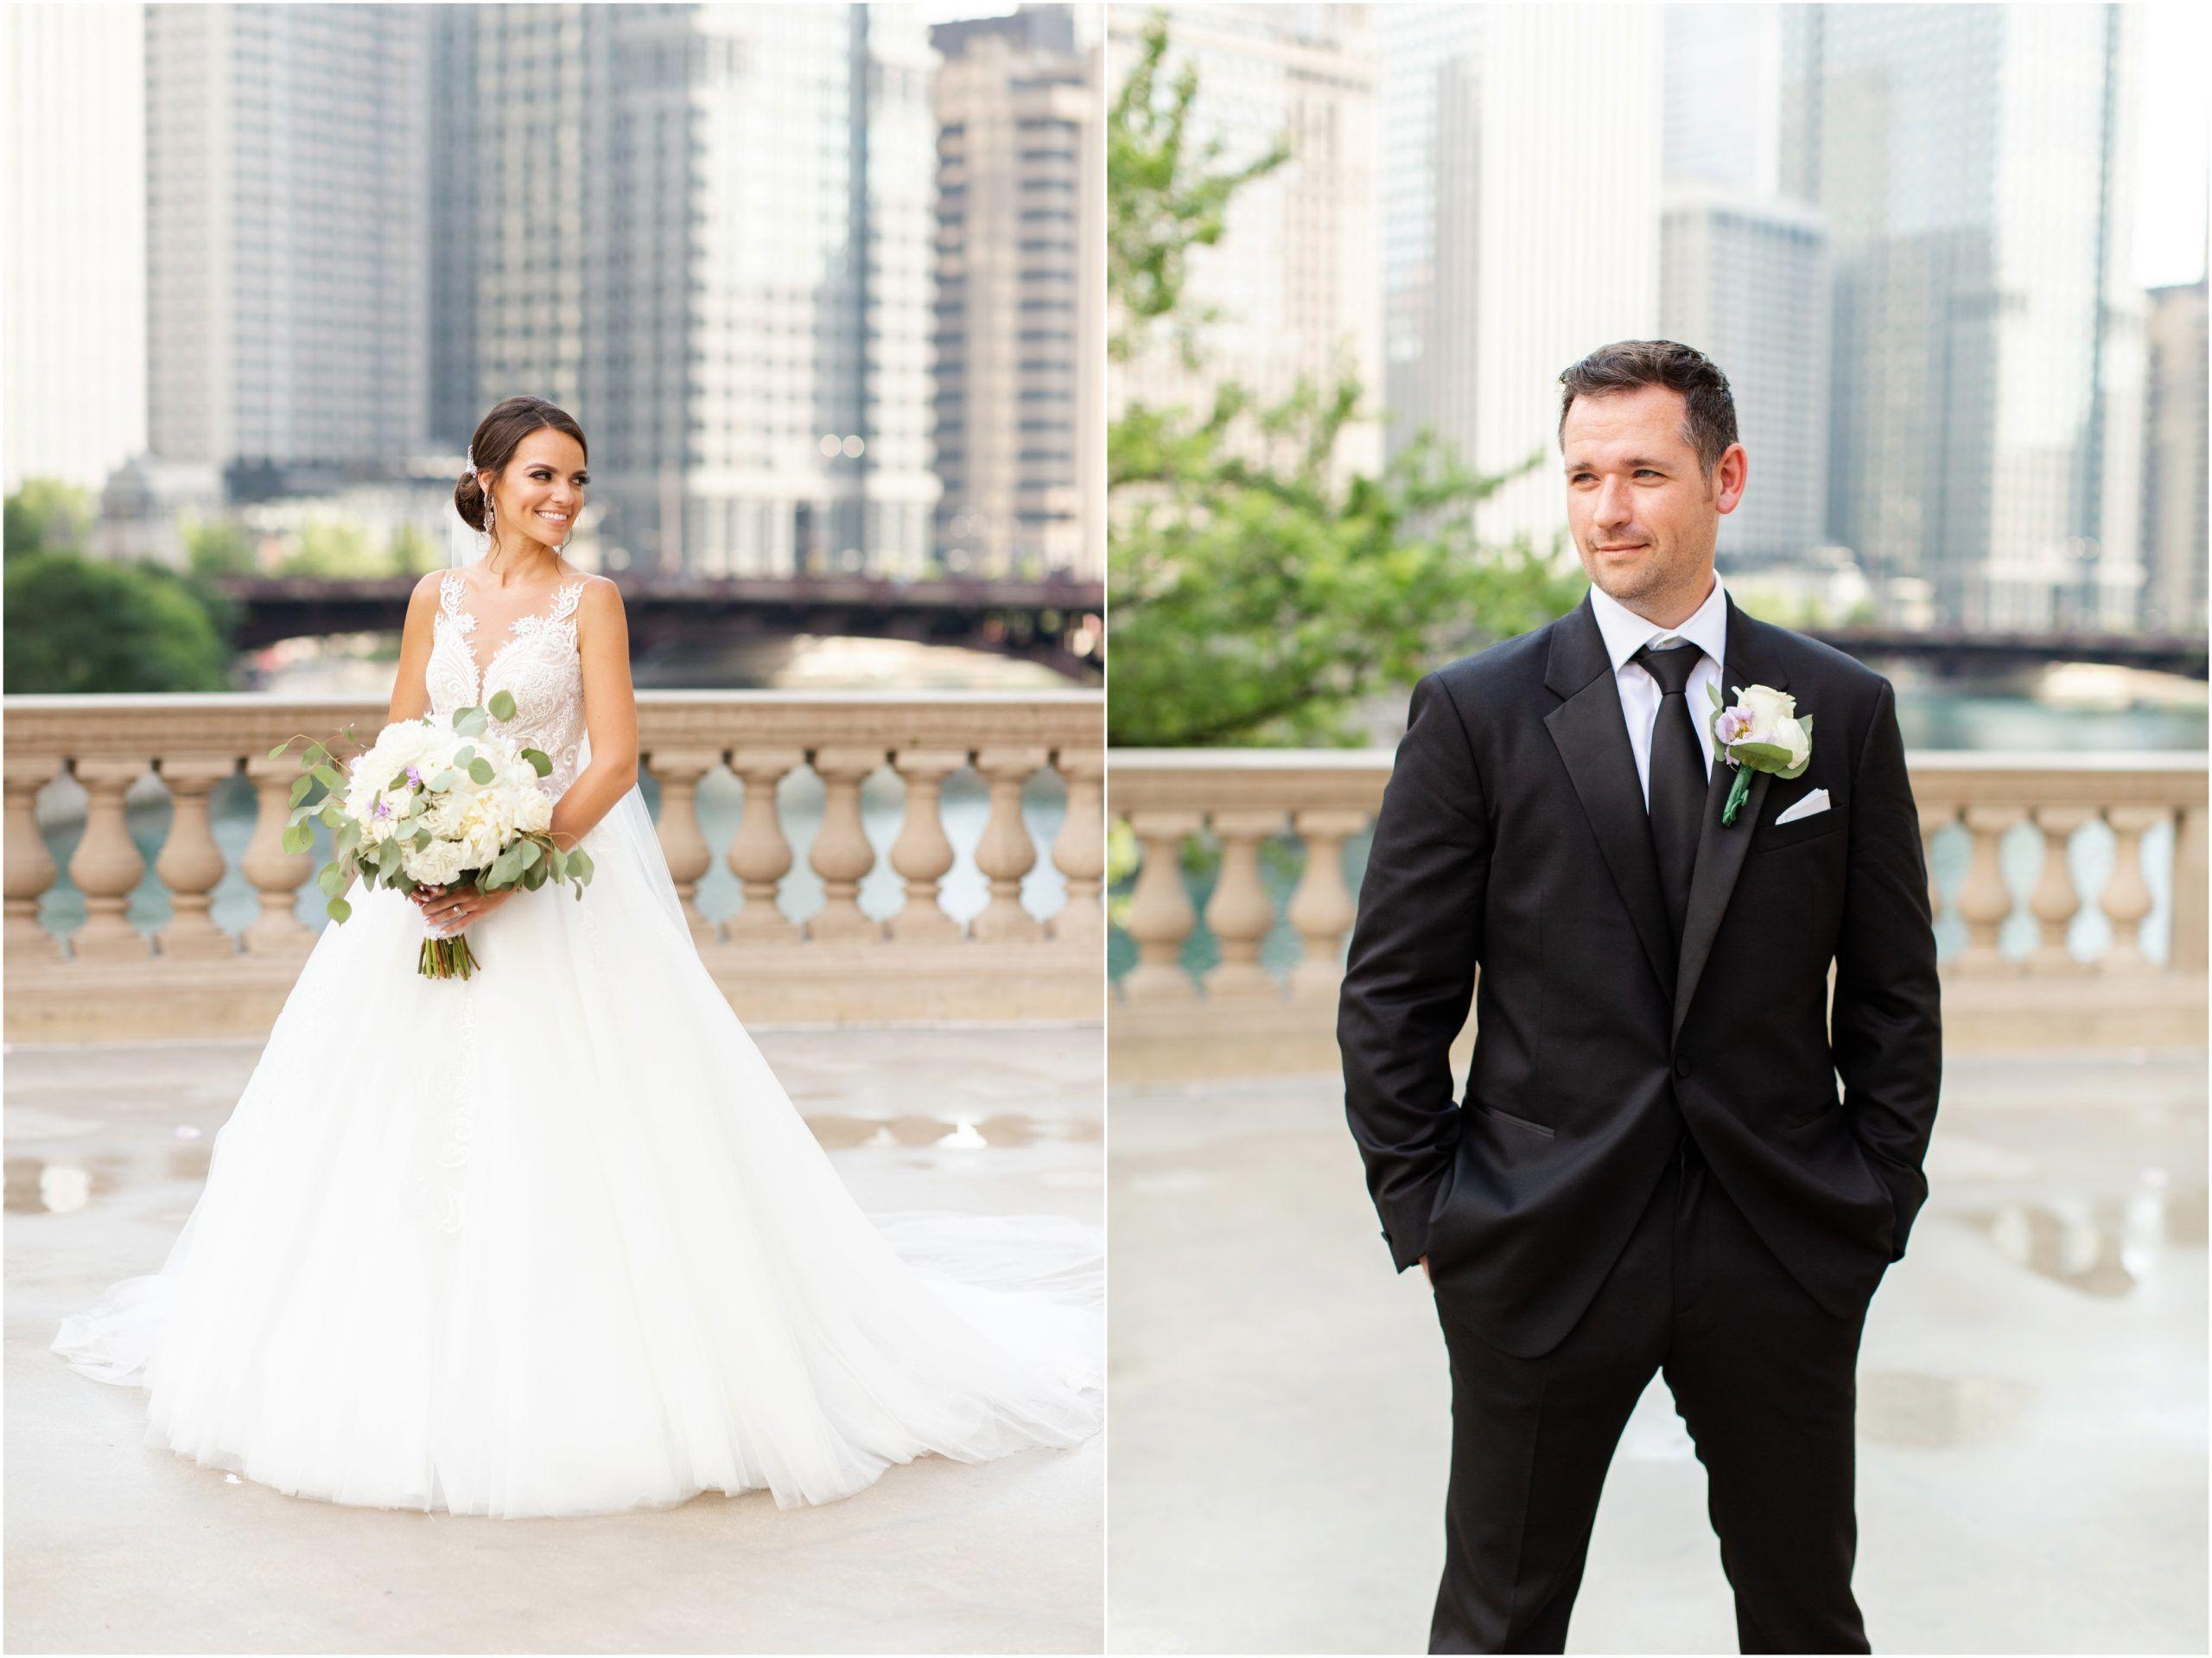 Intimate Chicago Wedding Alexandraleephoto In 2020 Chicago Wedding Chicago Wedding Photography Wedding Portraits